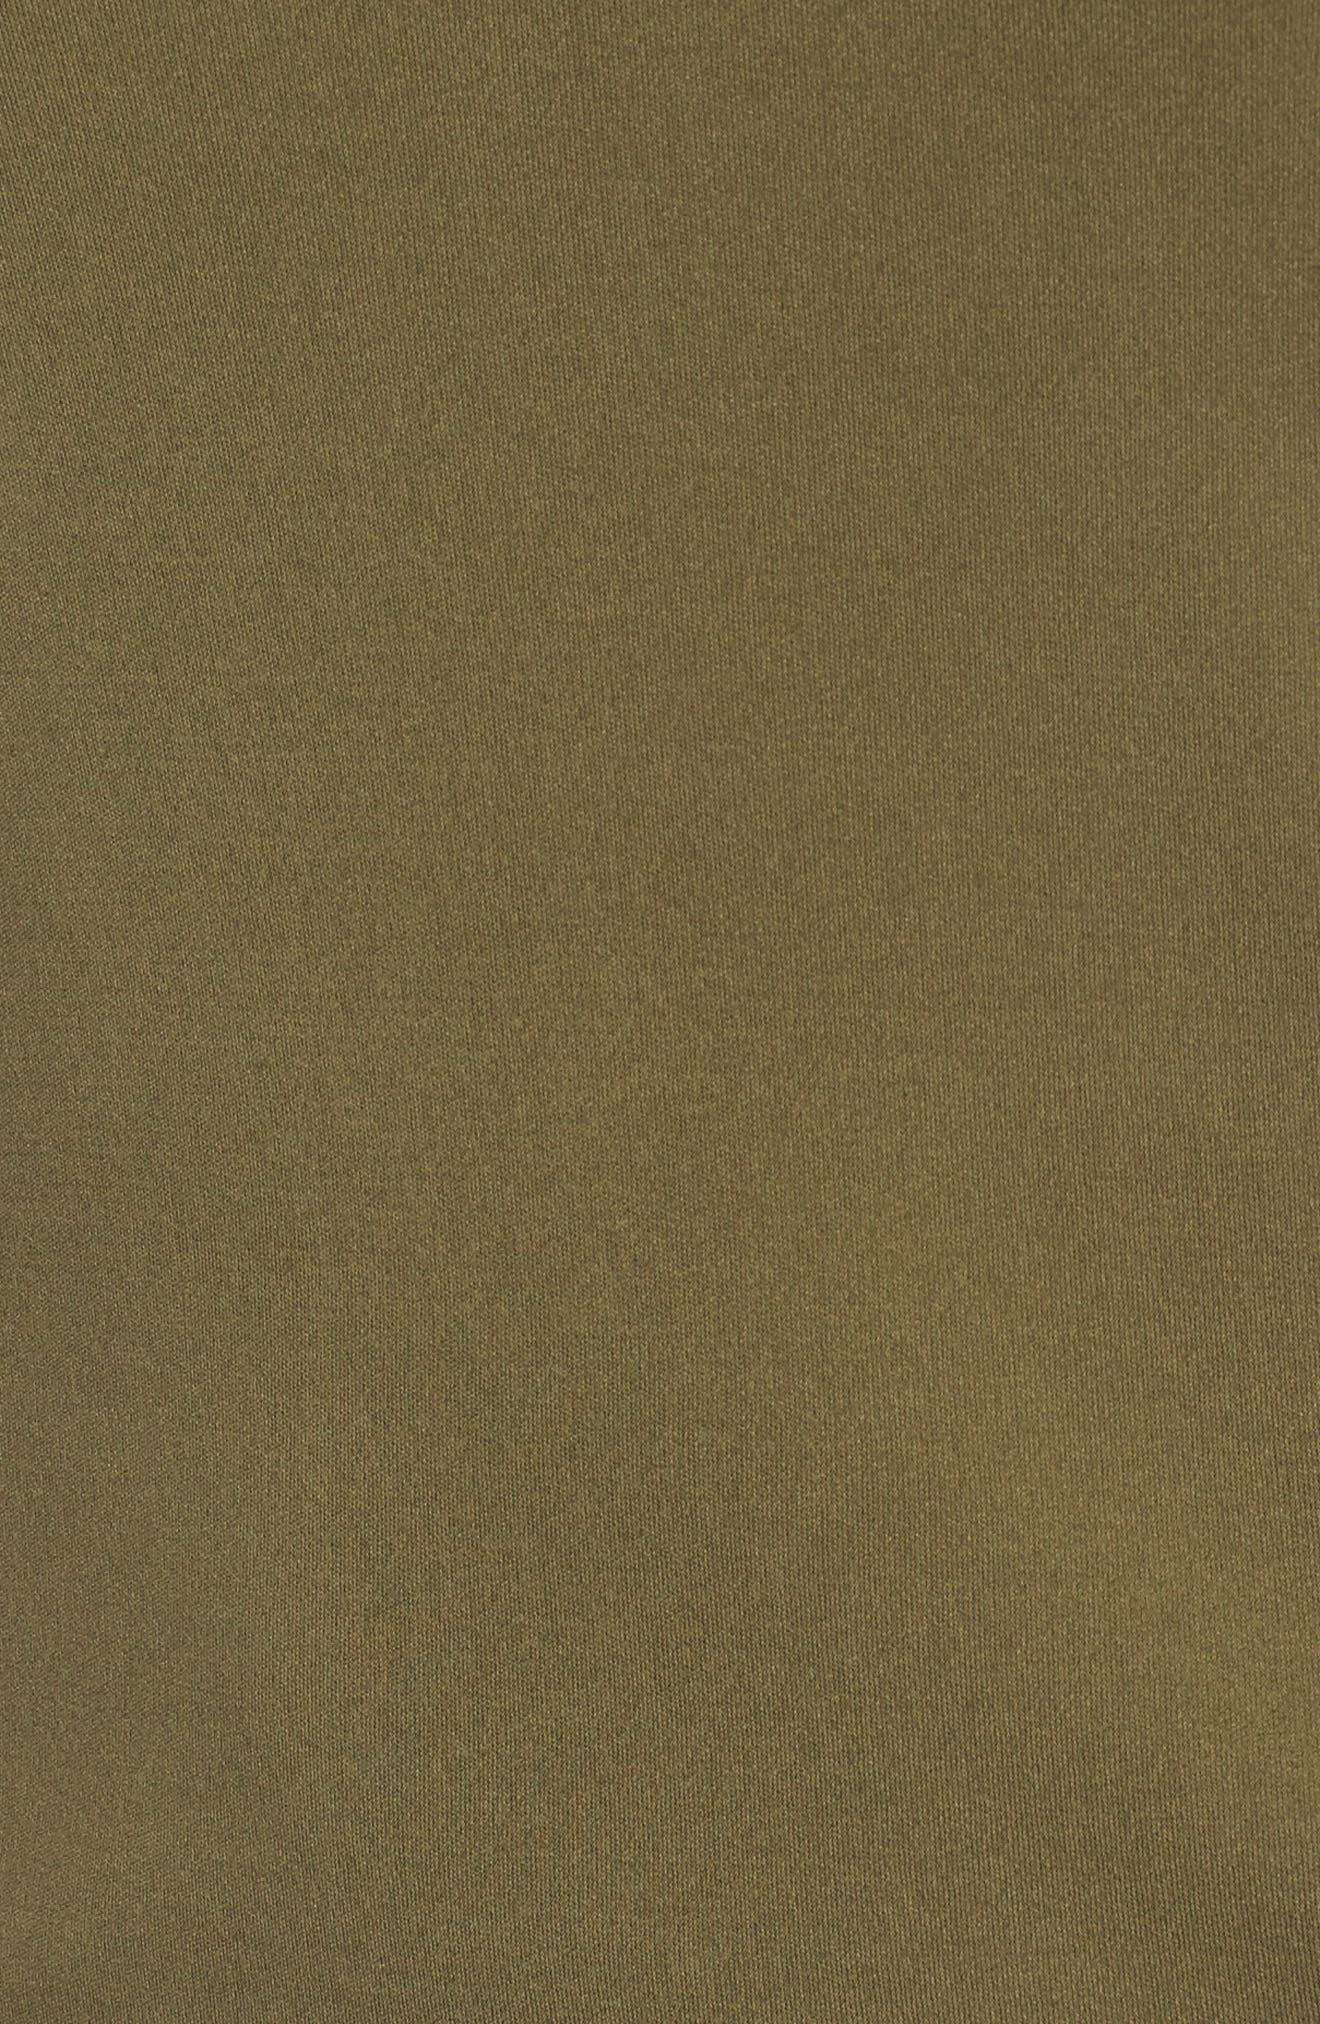 Long Scoop Neck Camisole,                             Alternate thumbnail 120, color,